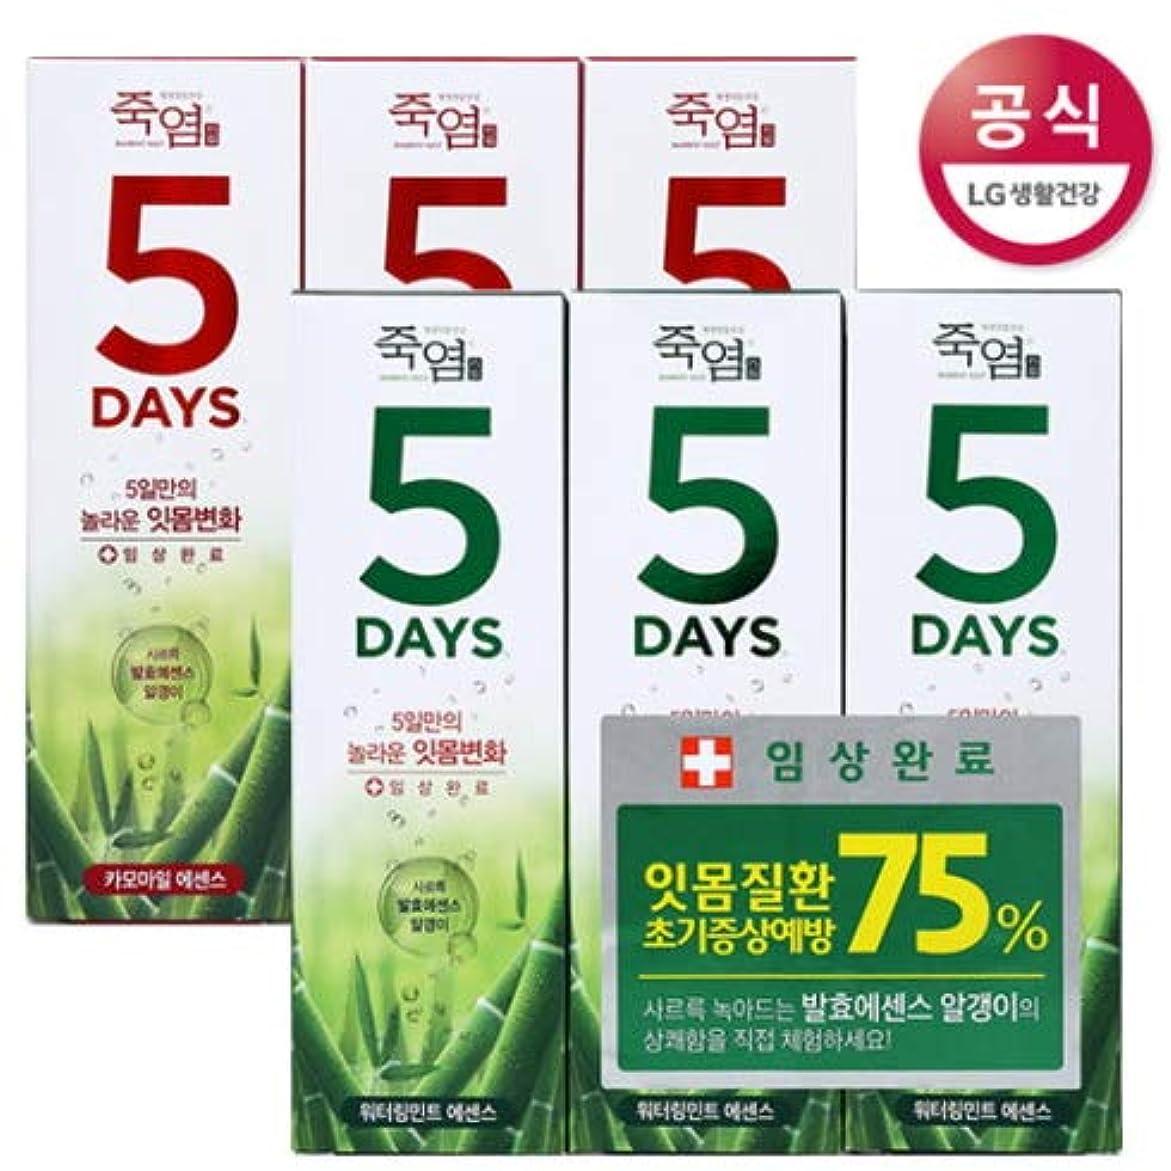 宇宙飛行士ボルト苦情文句[LG HnB] Bamboo Salt 5days Toothpaste /竹塩5days歯磨き粉 100gx6個(海外直送品)